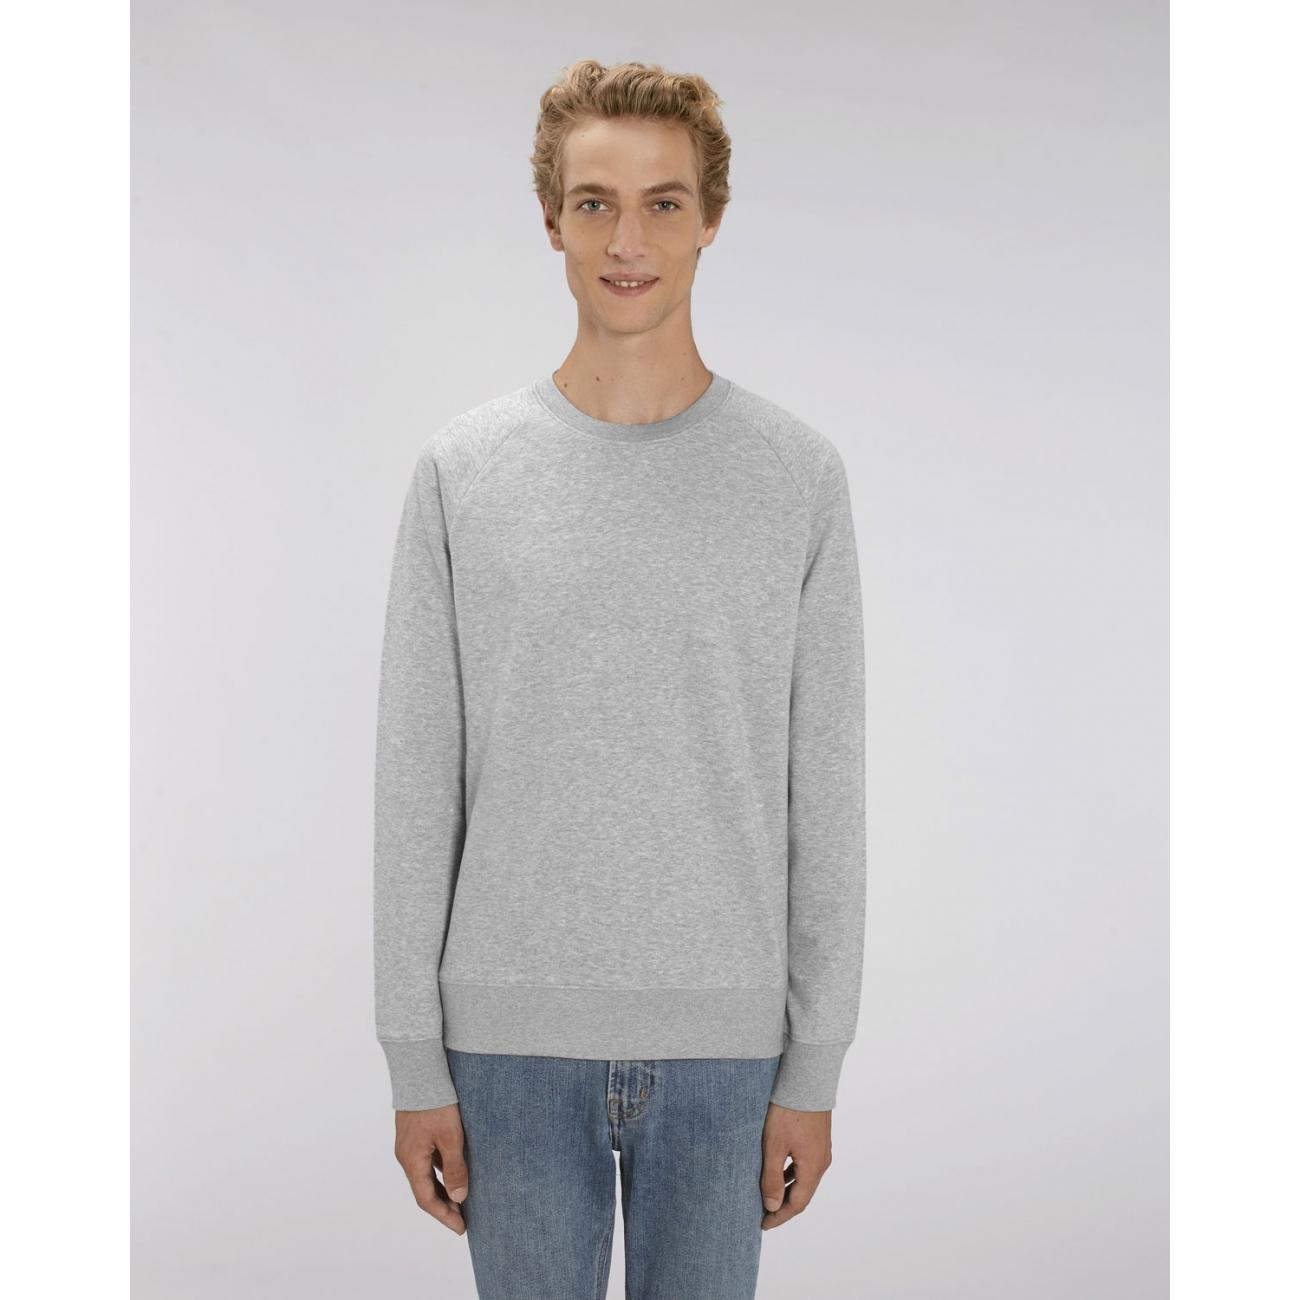 https://tee-shirt-bio.com/8550-thickbox_default/sweat-shirt-col-rond-coton-bio-homme-gris-chine-clair-stroller.jpg